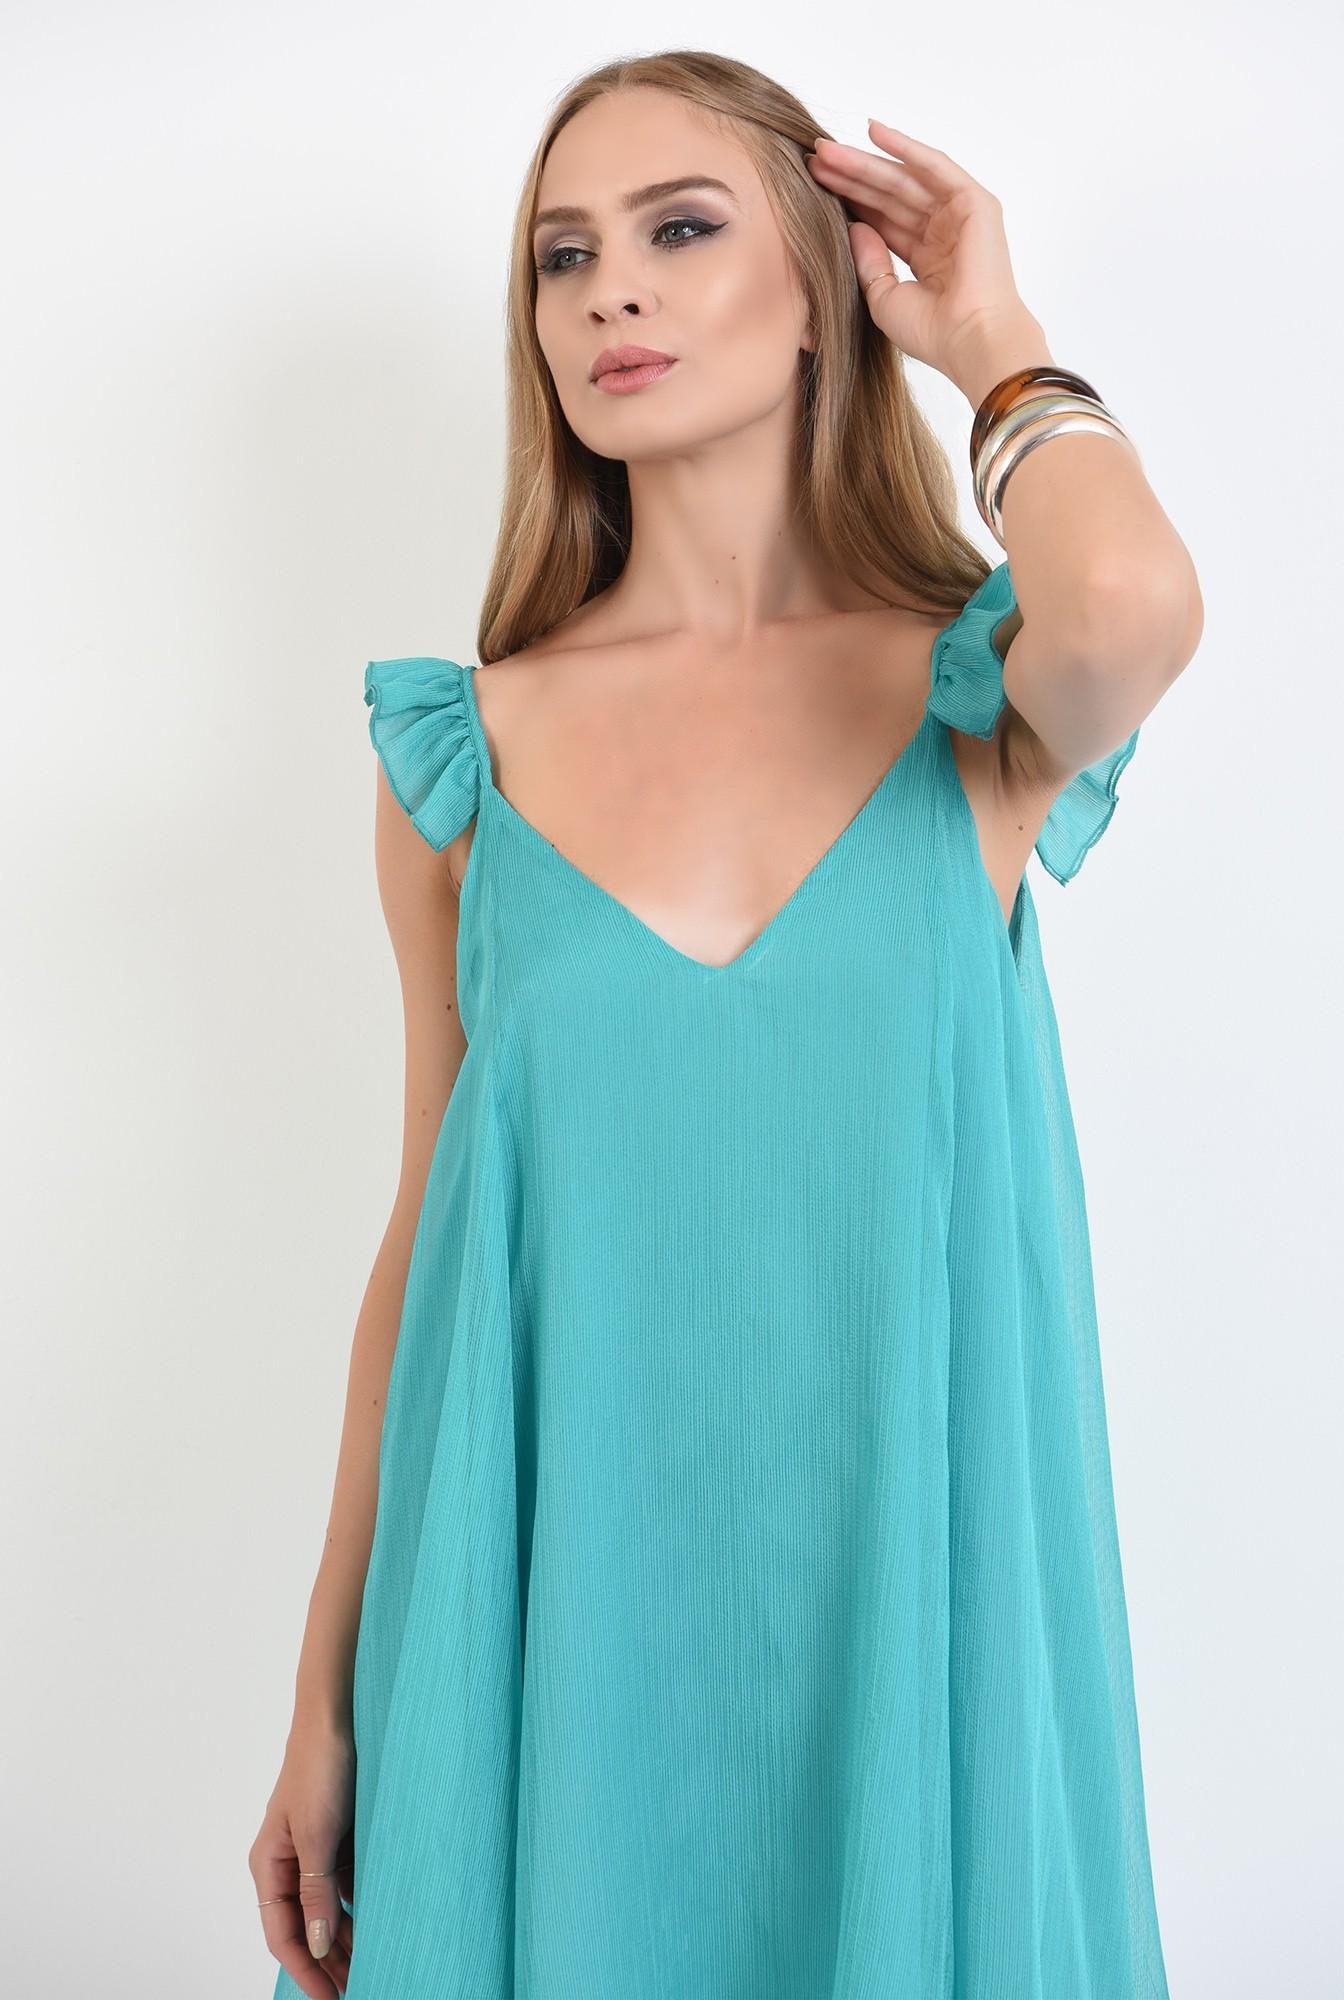 2 - rochie mini, de vara, turcoaz, cu bretele, cu anchior